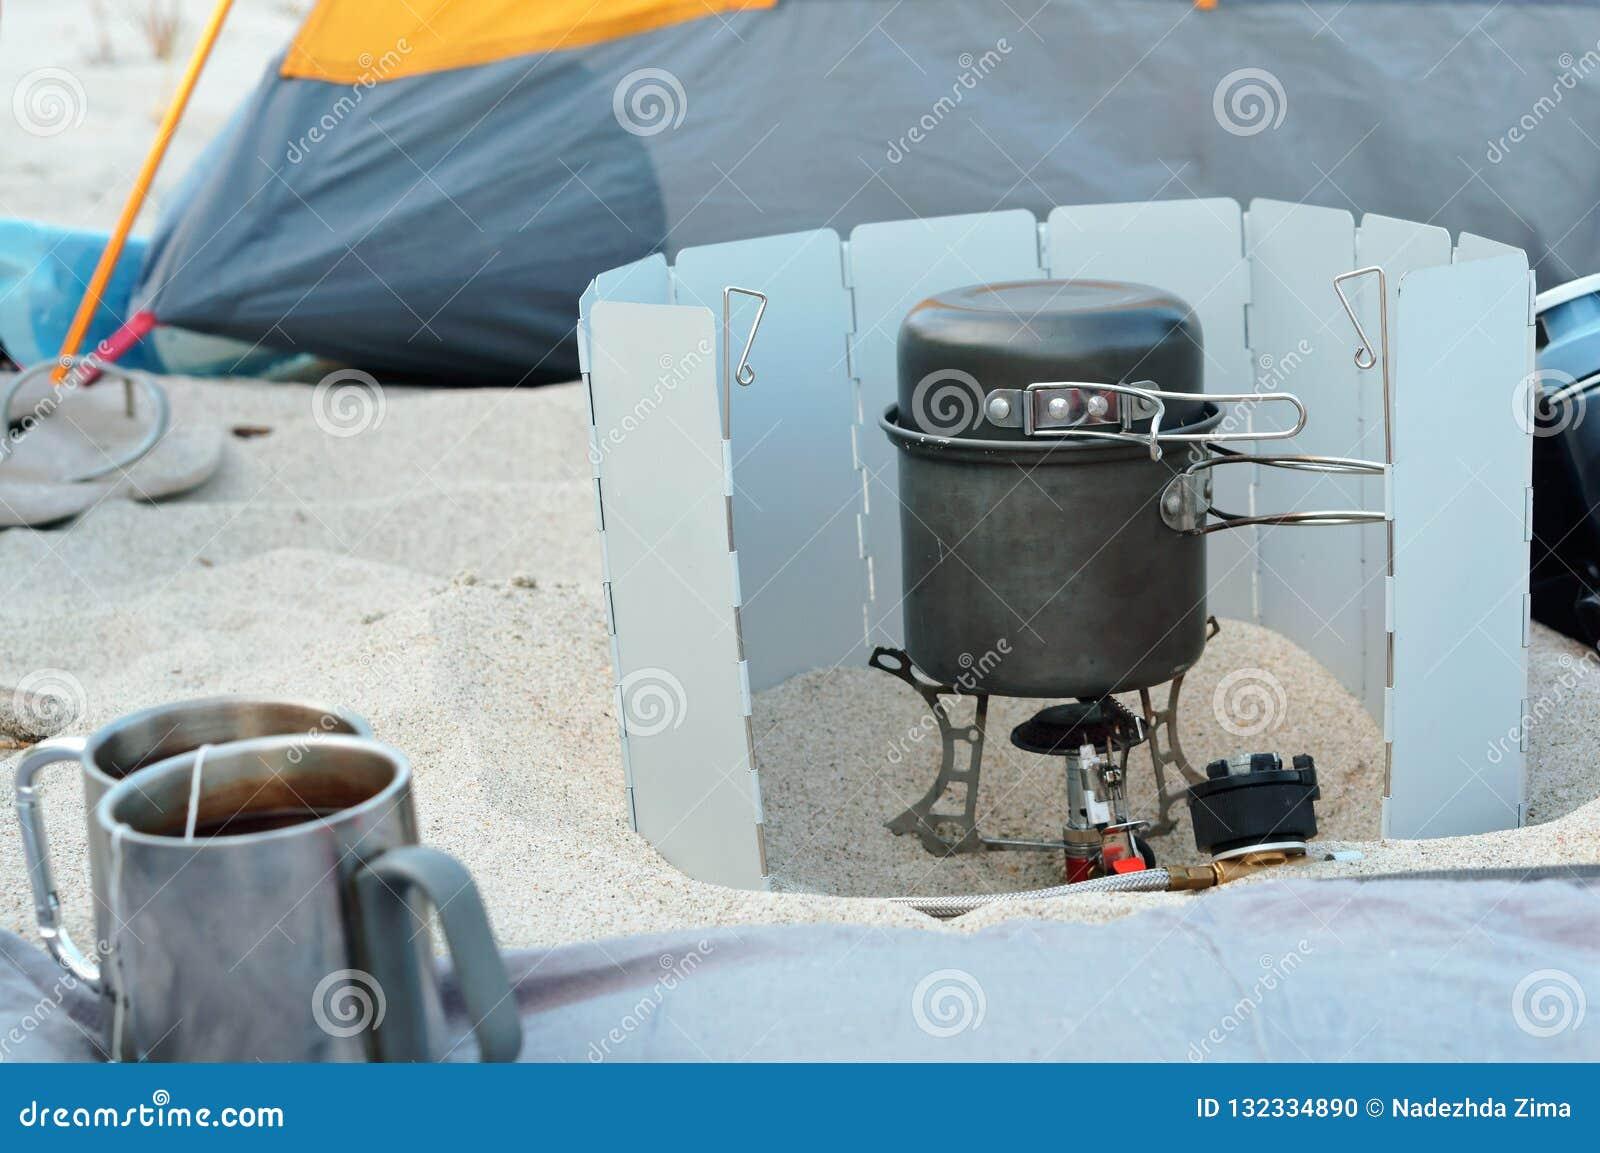 Gas burner traveler, tourist cooking set